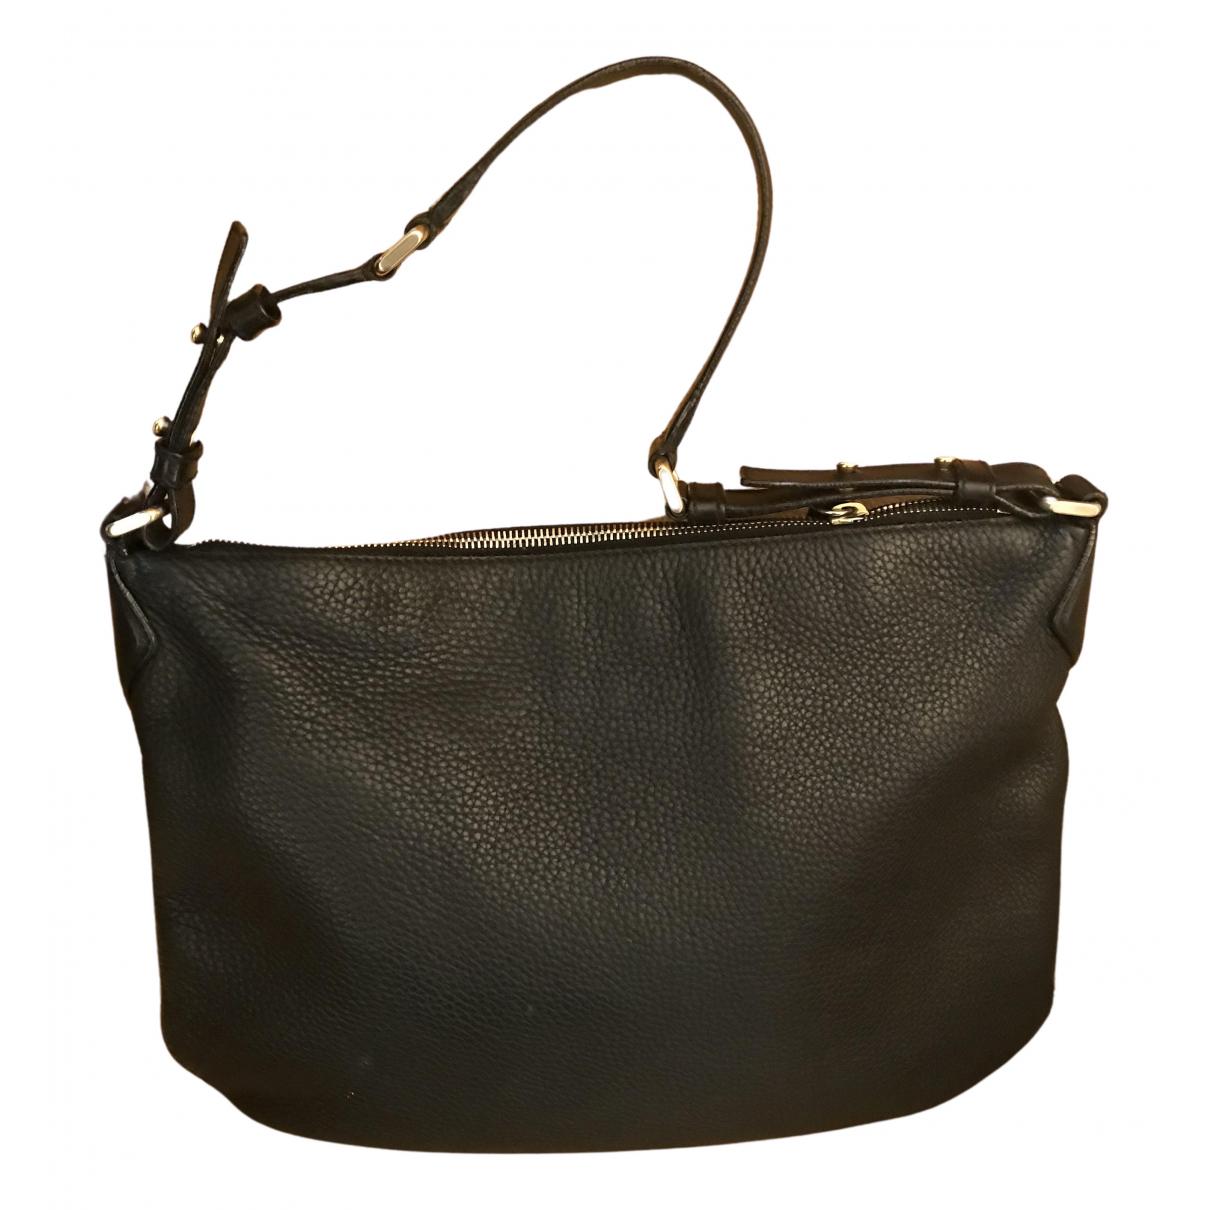 Jil Sander N Black Leather handbag for Women N